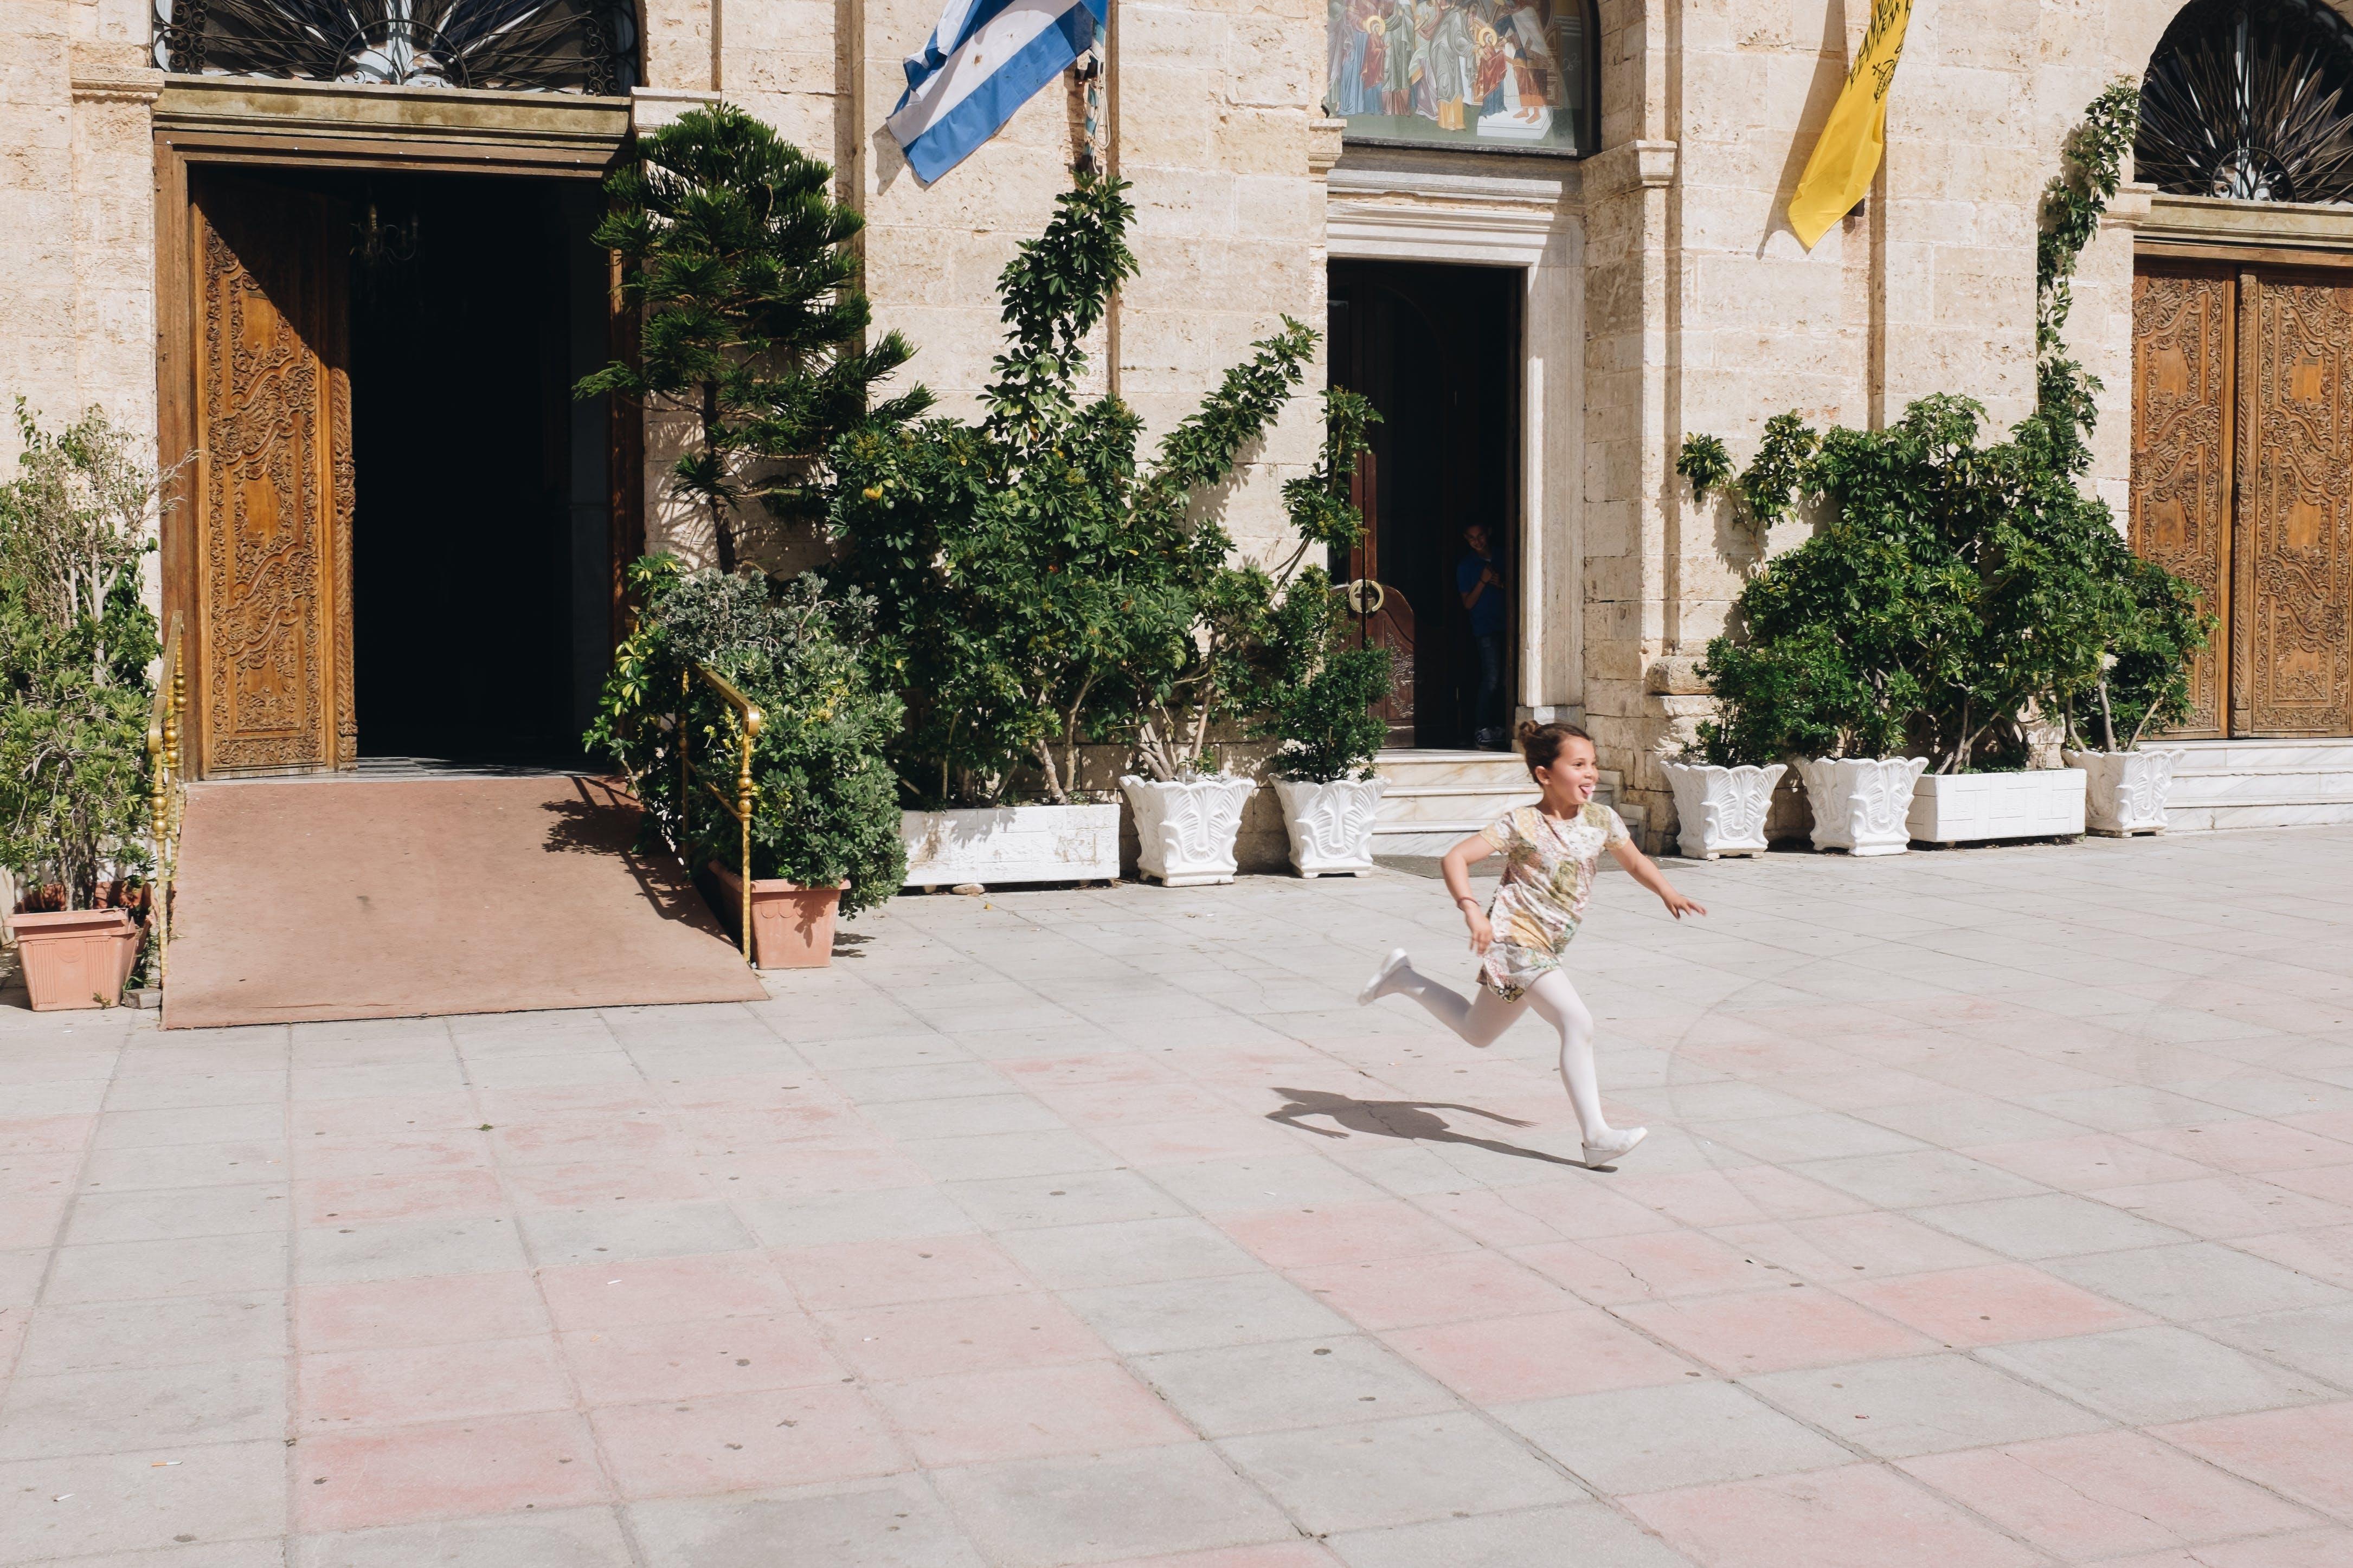 Boy Running on Gray Concrete Floor